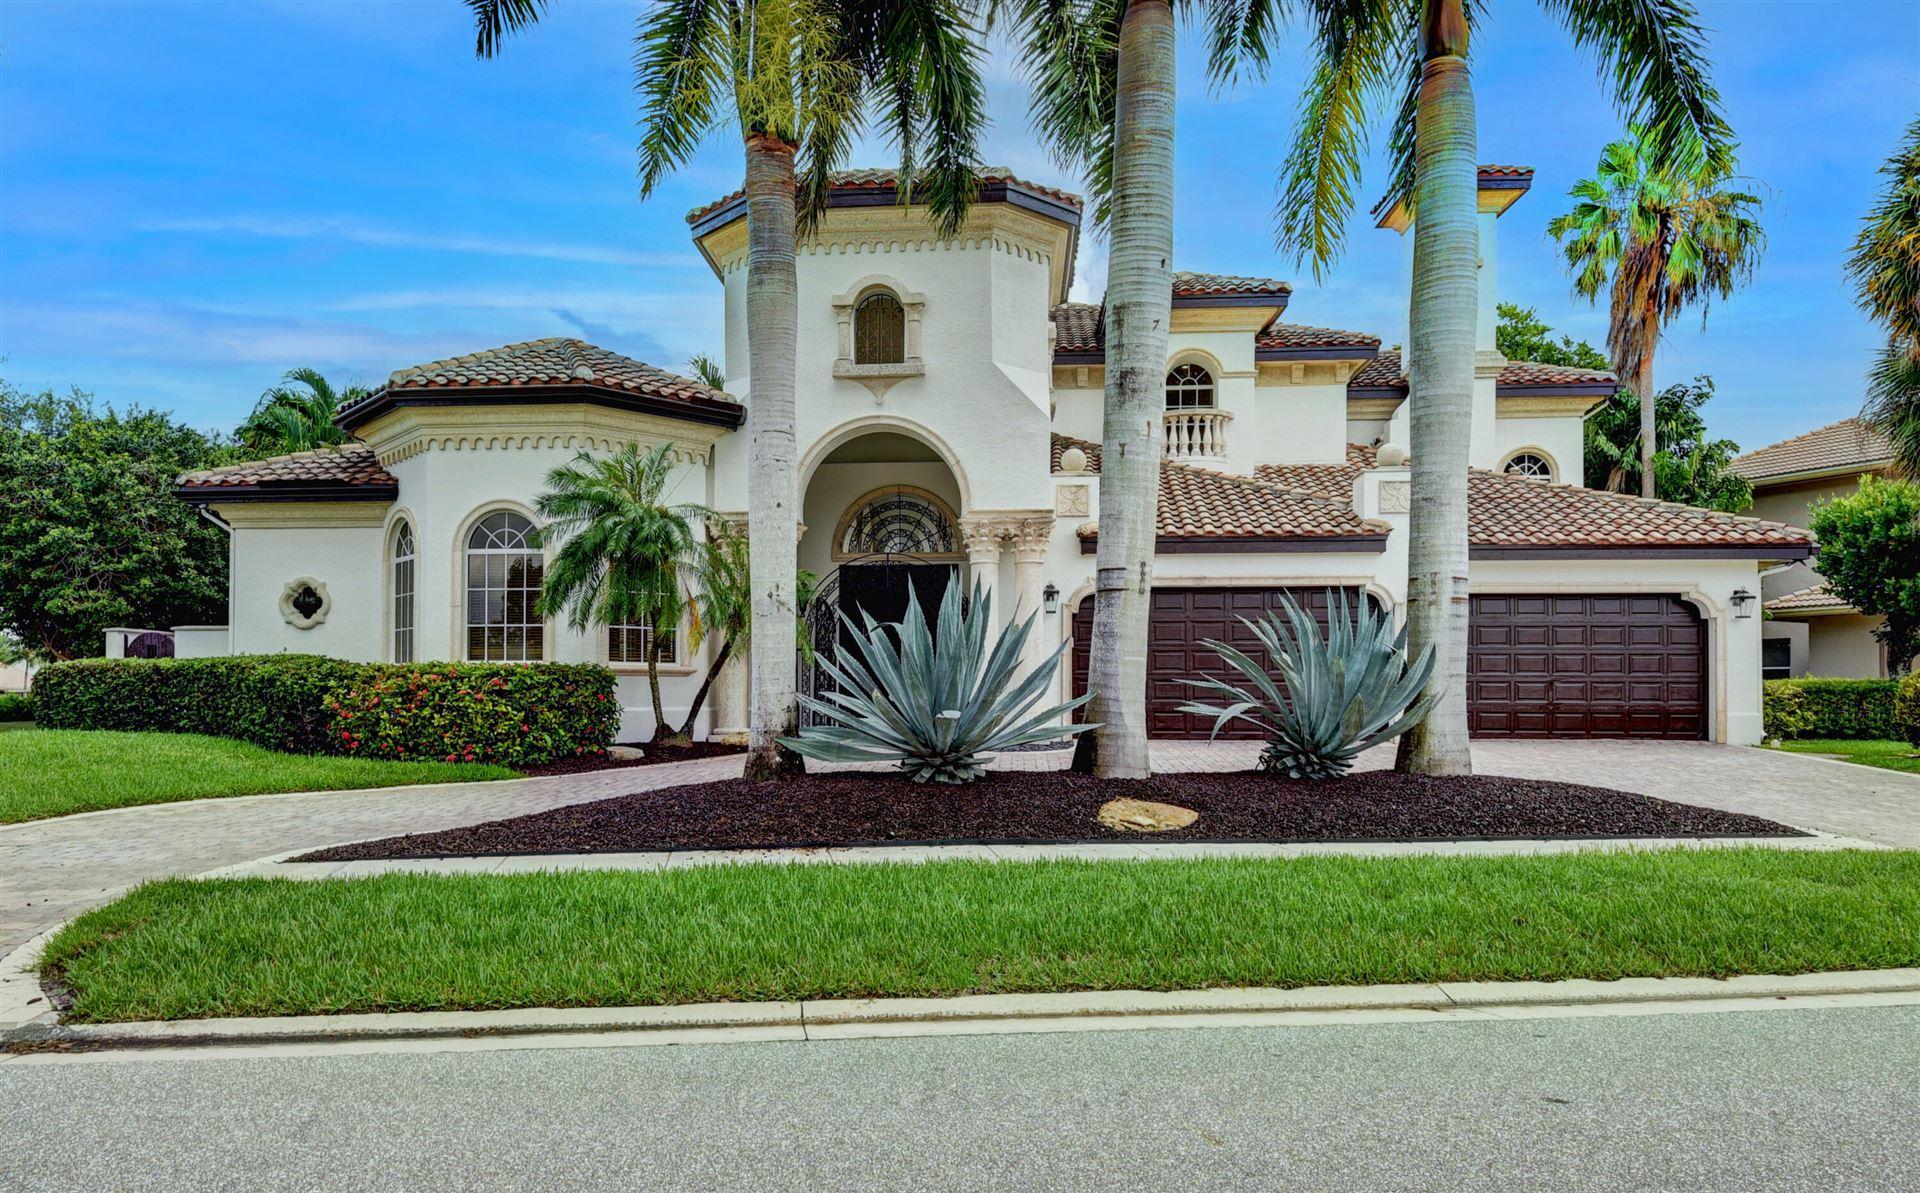 7635 Mandarin Drive, Boca Raton, FL 33433 - MLS#: RX-10713222